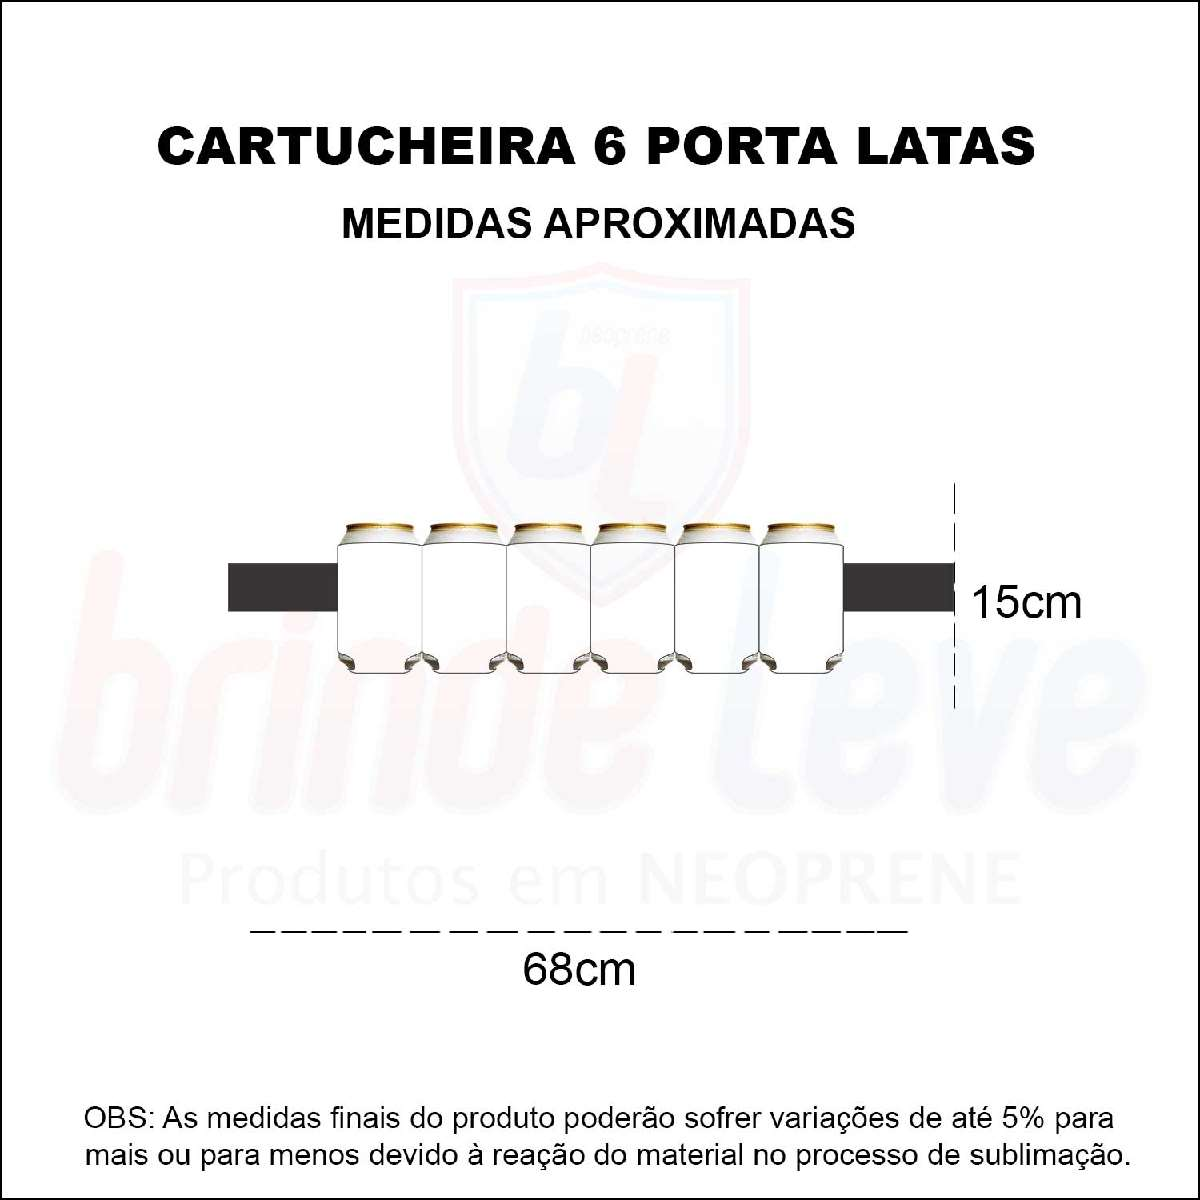 Medidas Cartucheira Cinto Porta Lata Personalizado 6 Latas